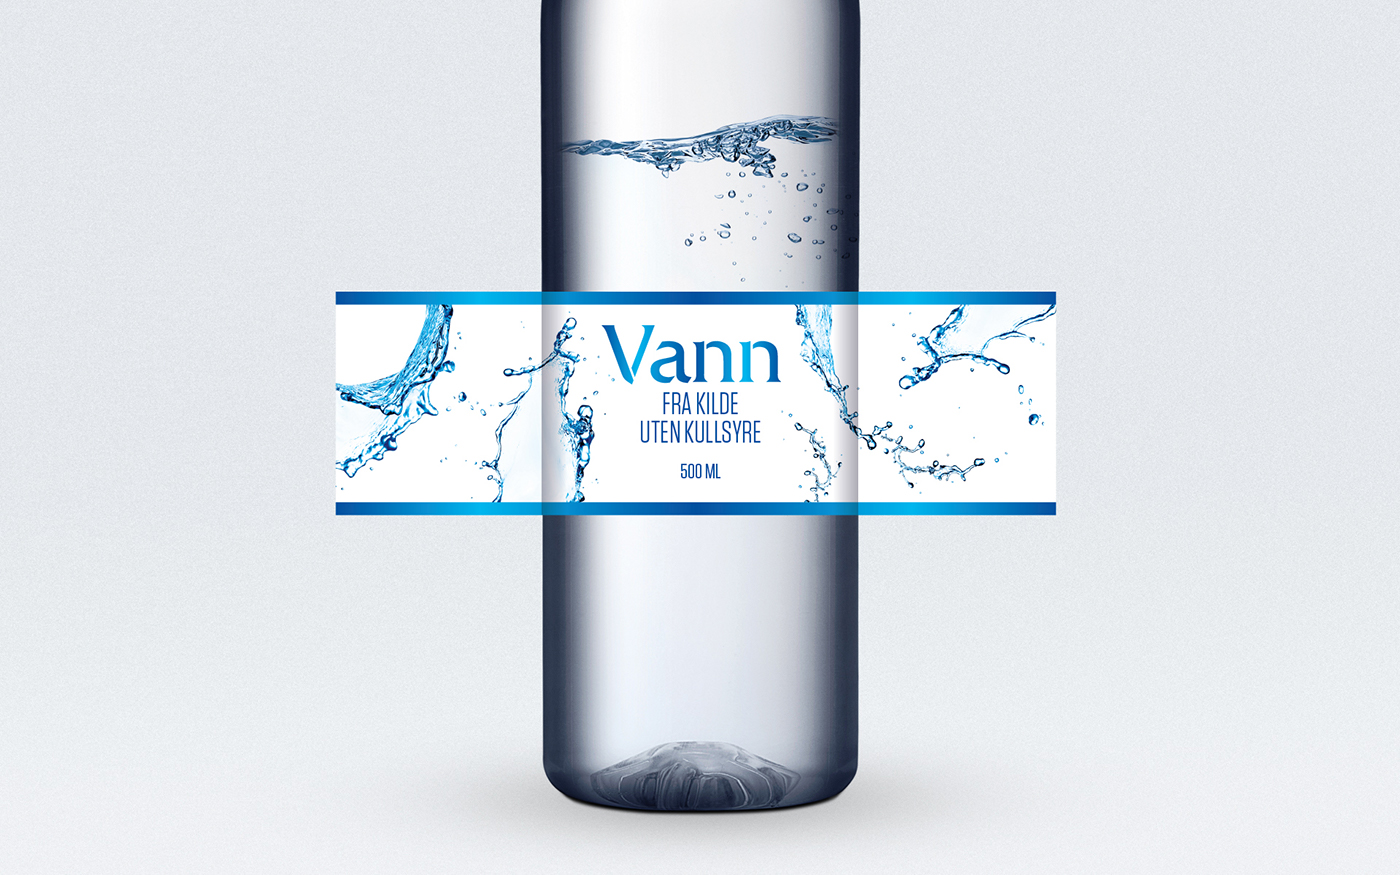 norway europris water bottle fjeldheimpartners concept logo identity